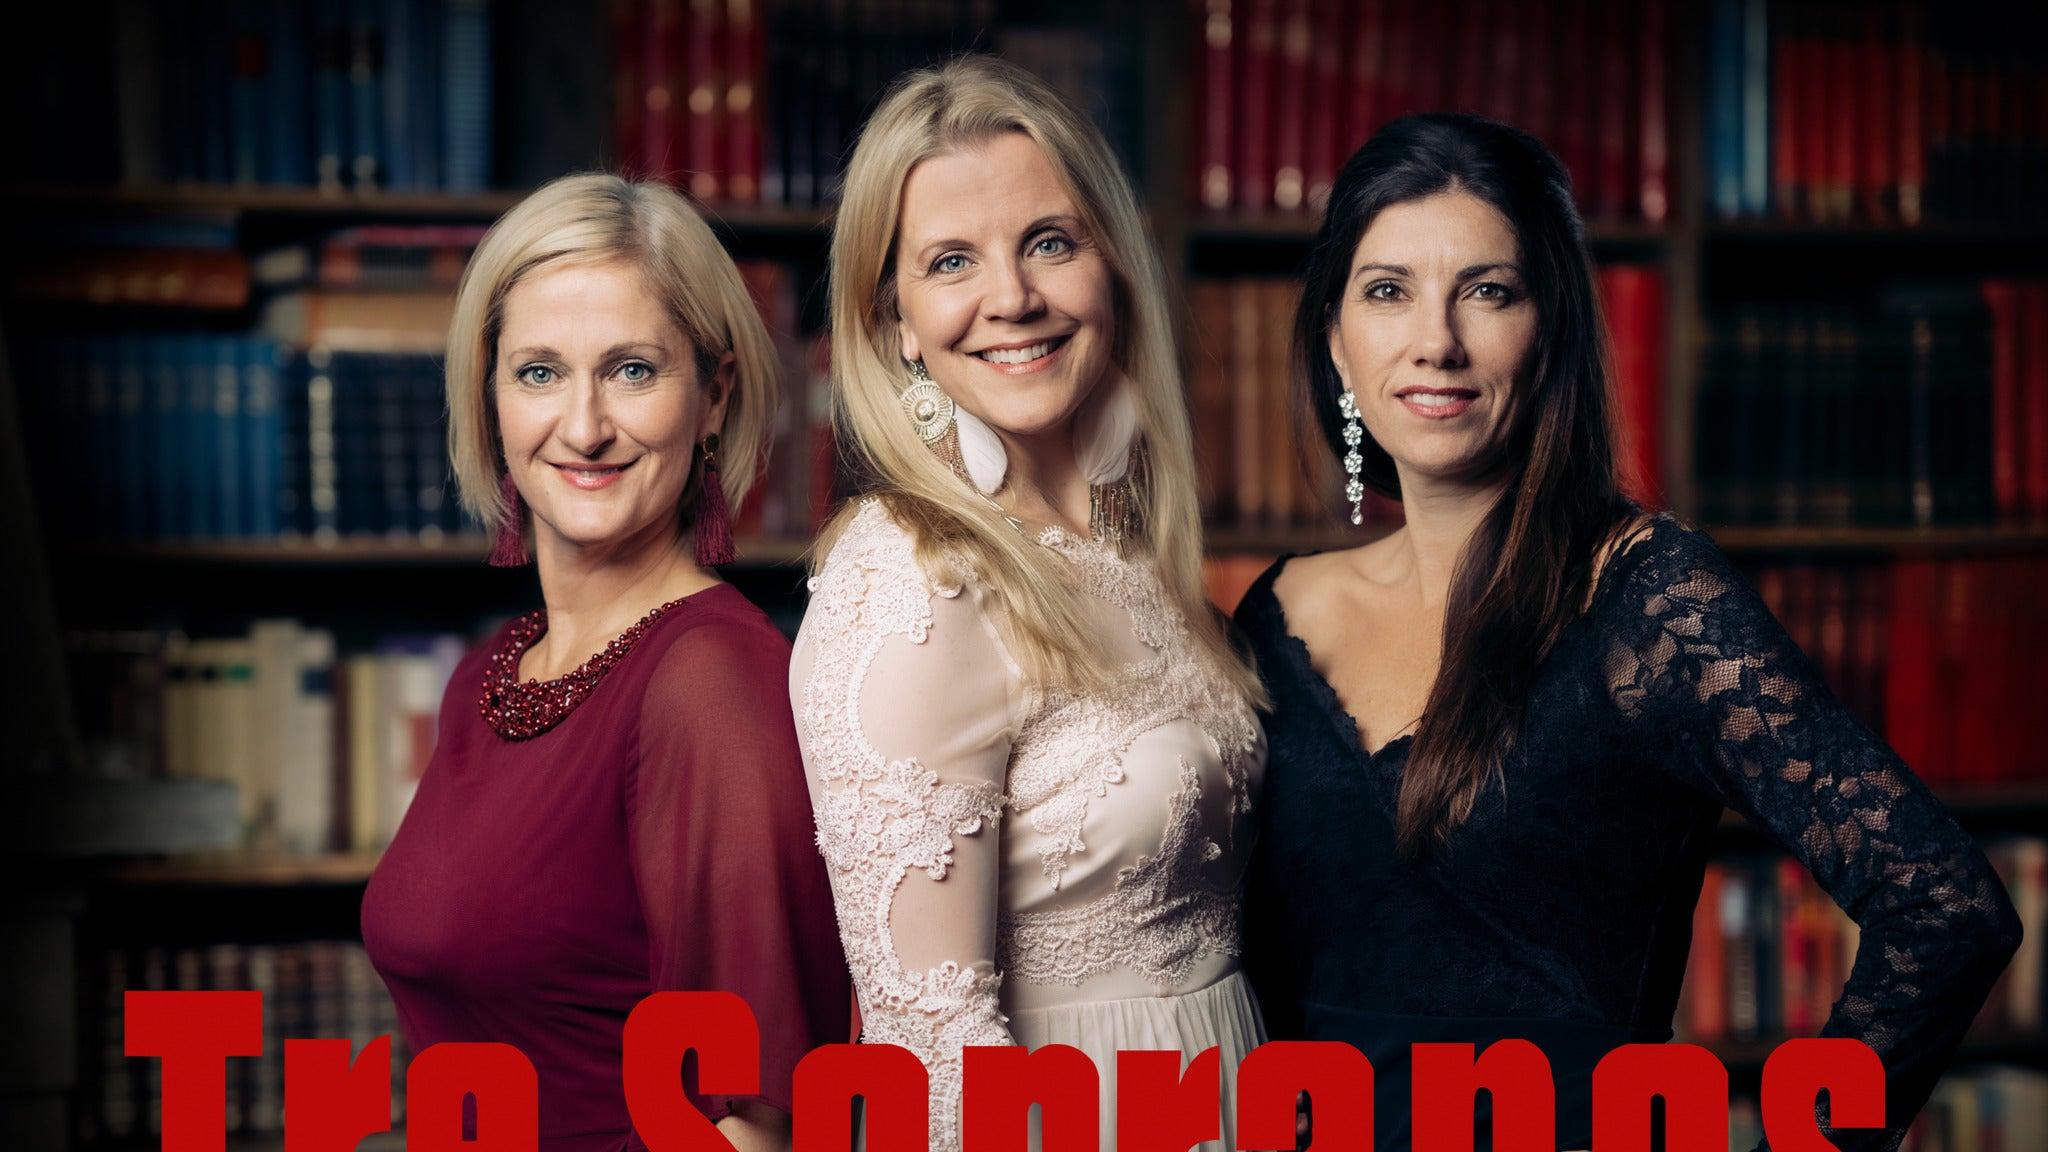 Tre Sopranos